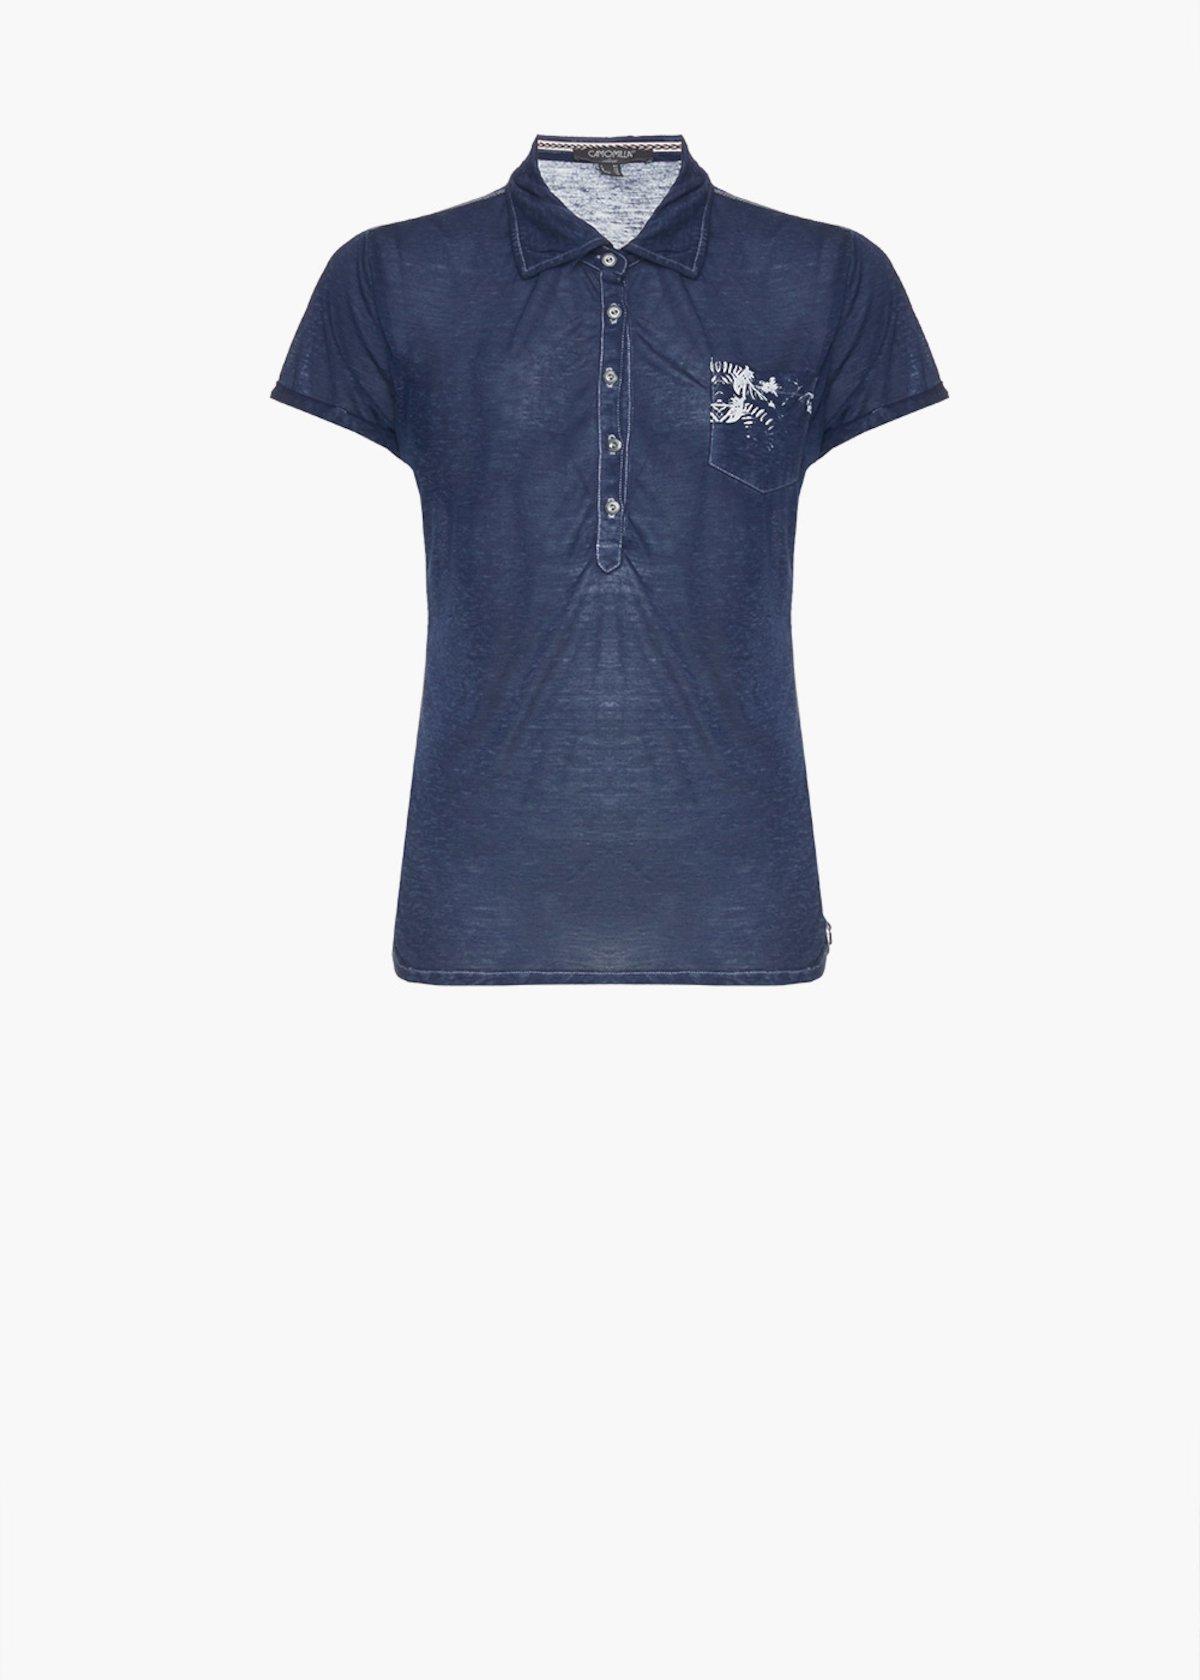 T-shirt Selly con taschino laterale - Blue / White Fantasia - Donna